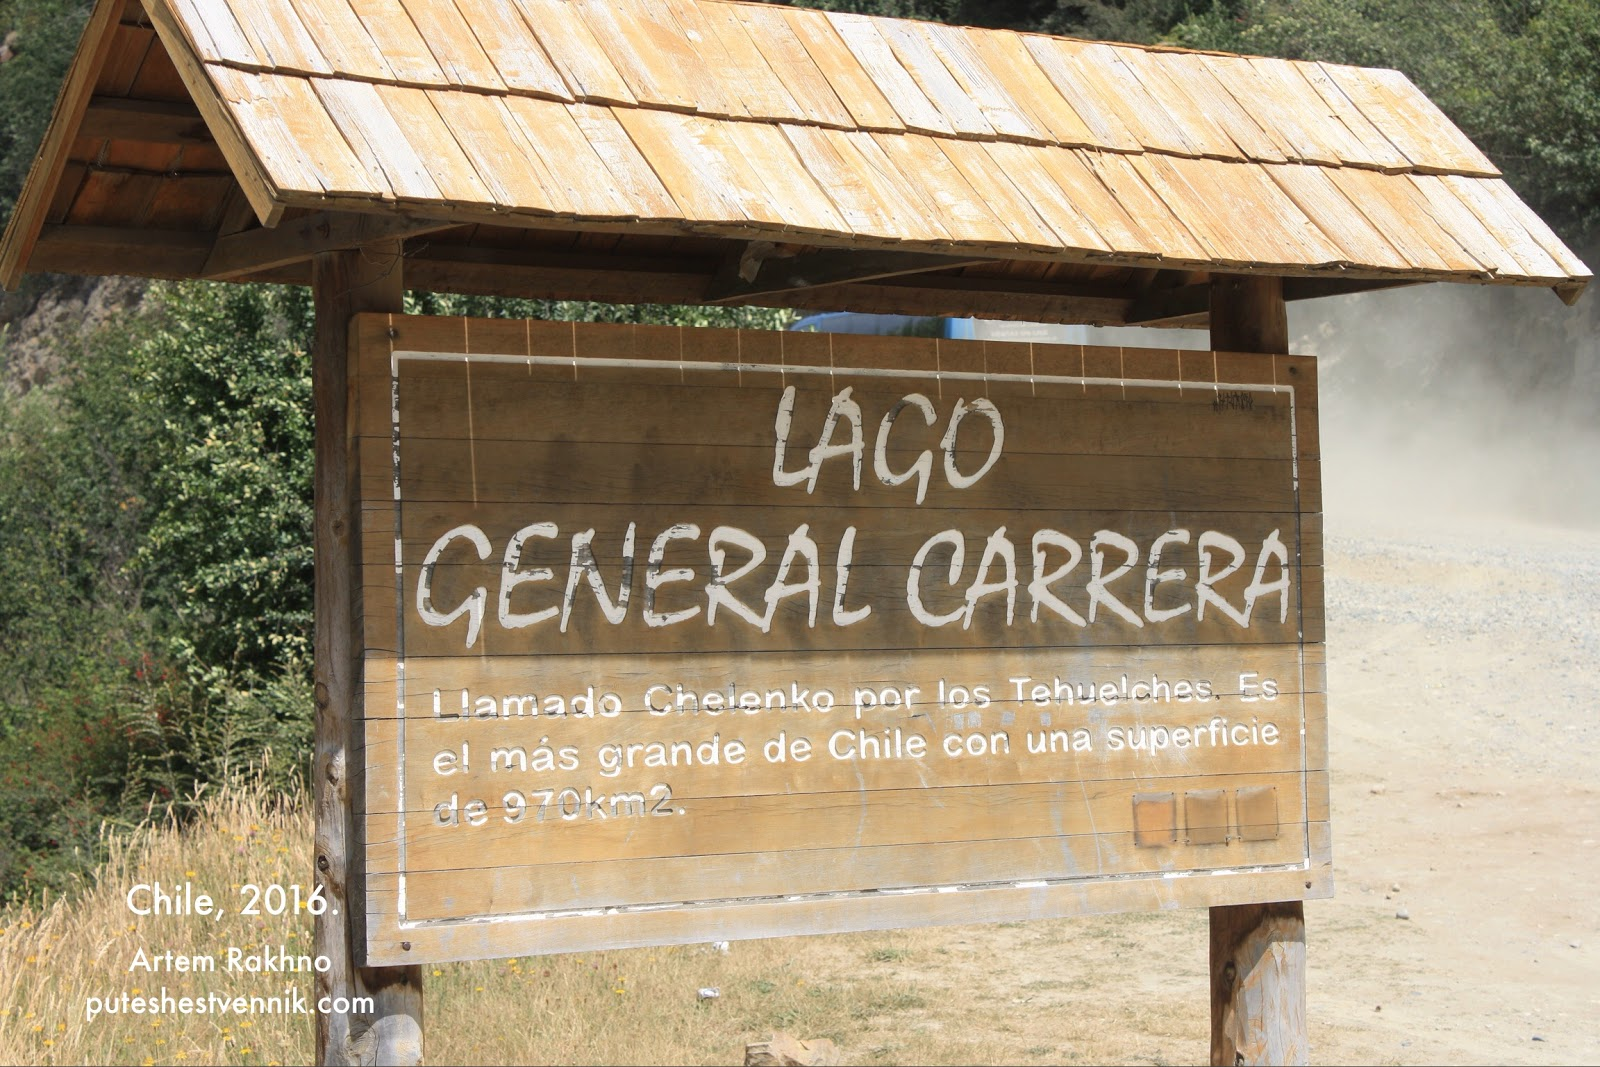 Озеро Каррера в Чили